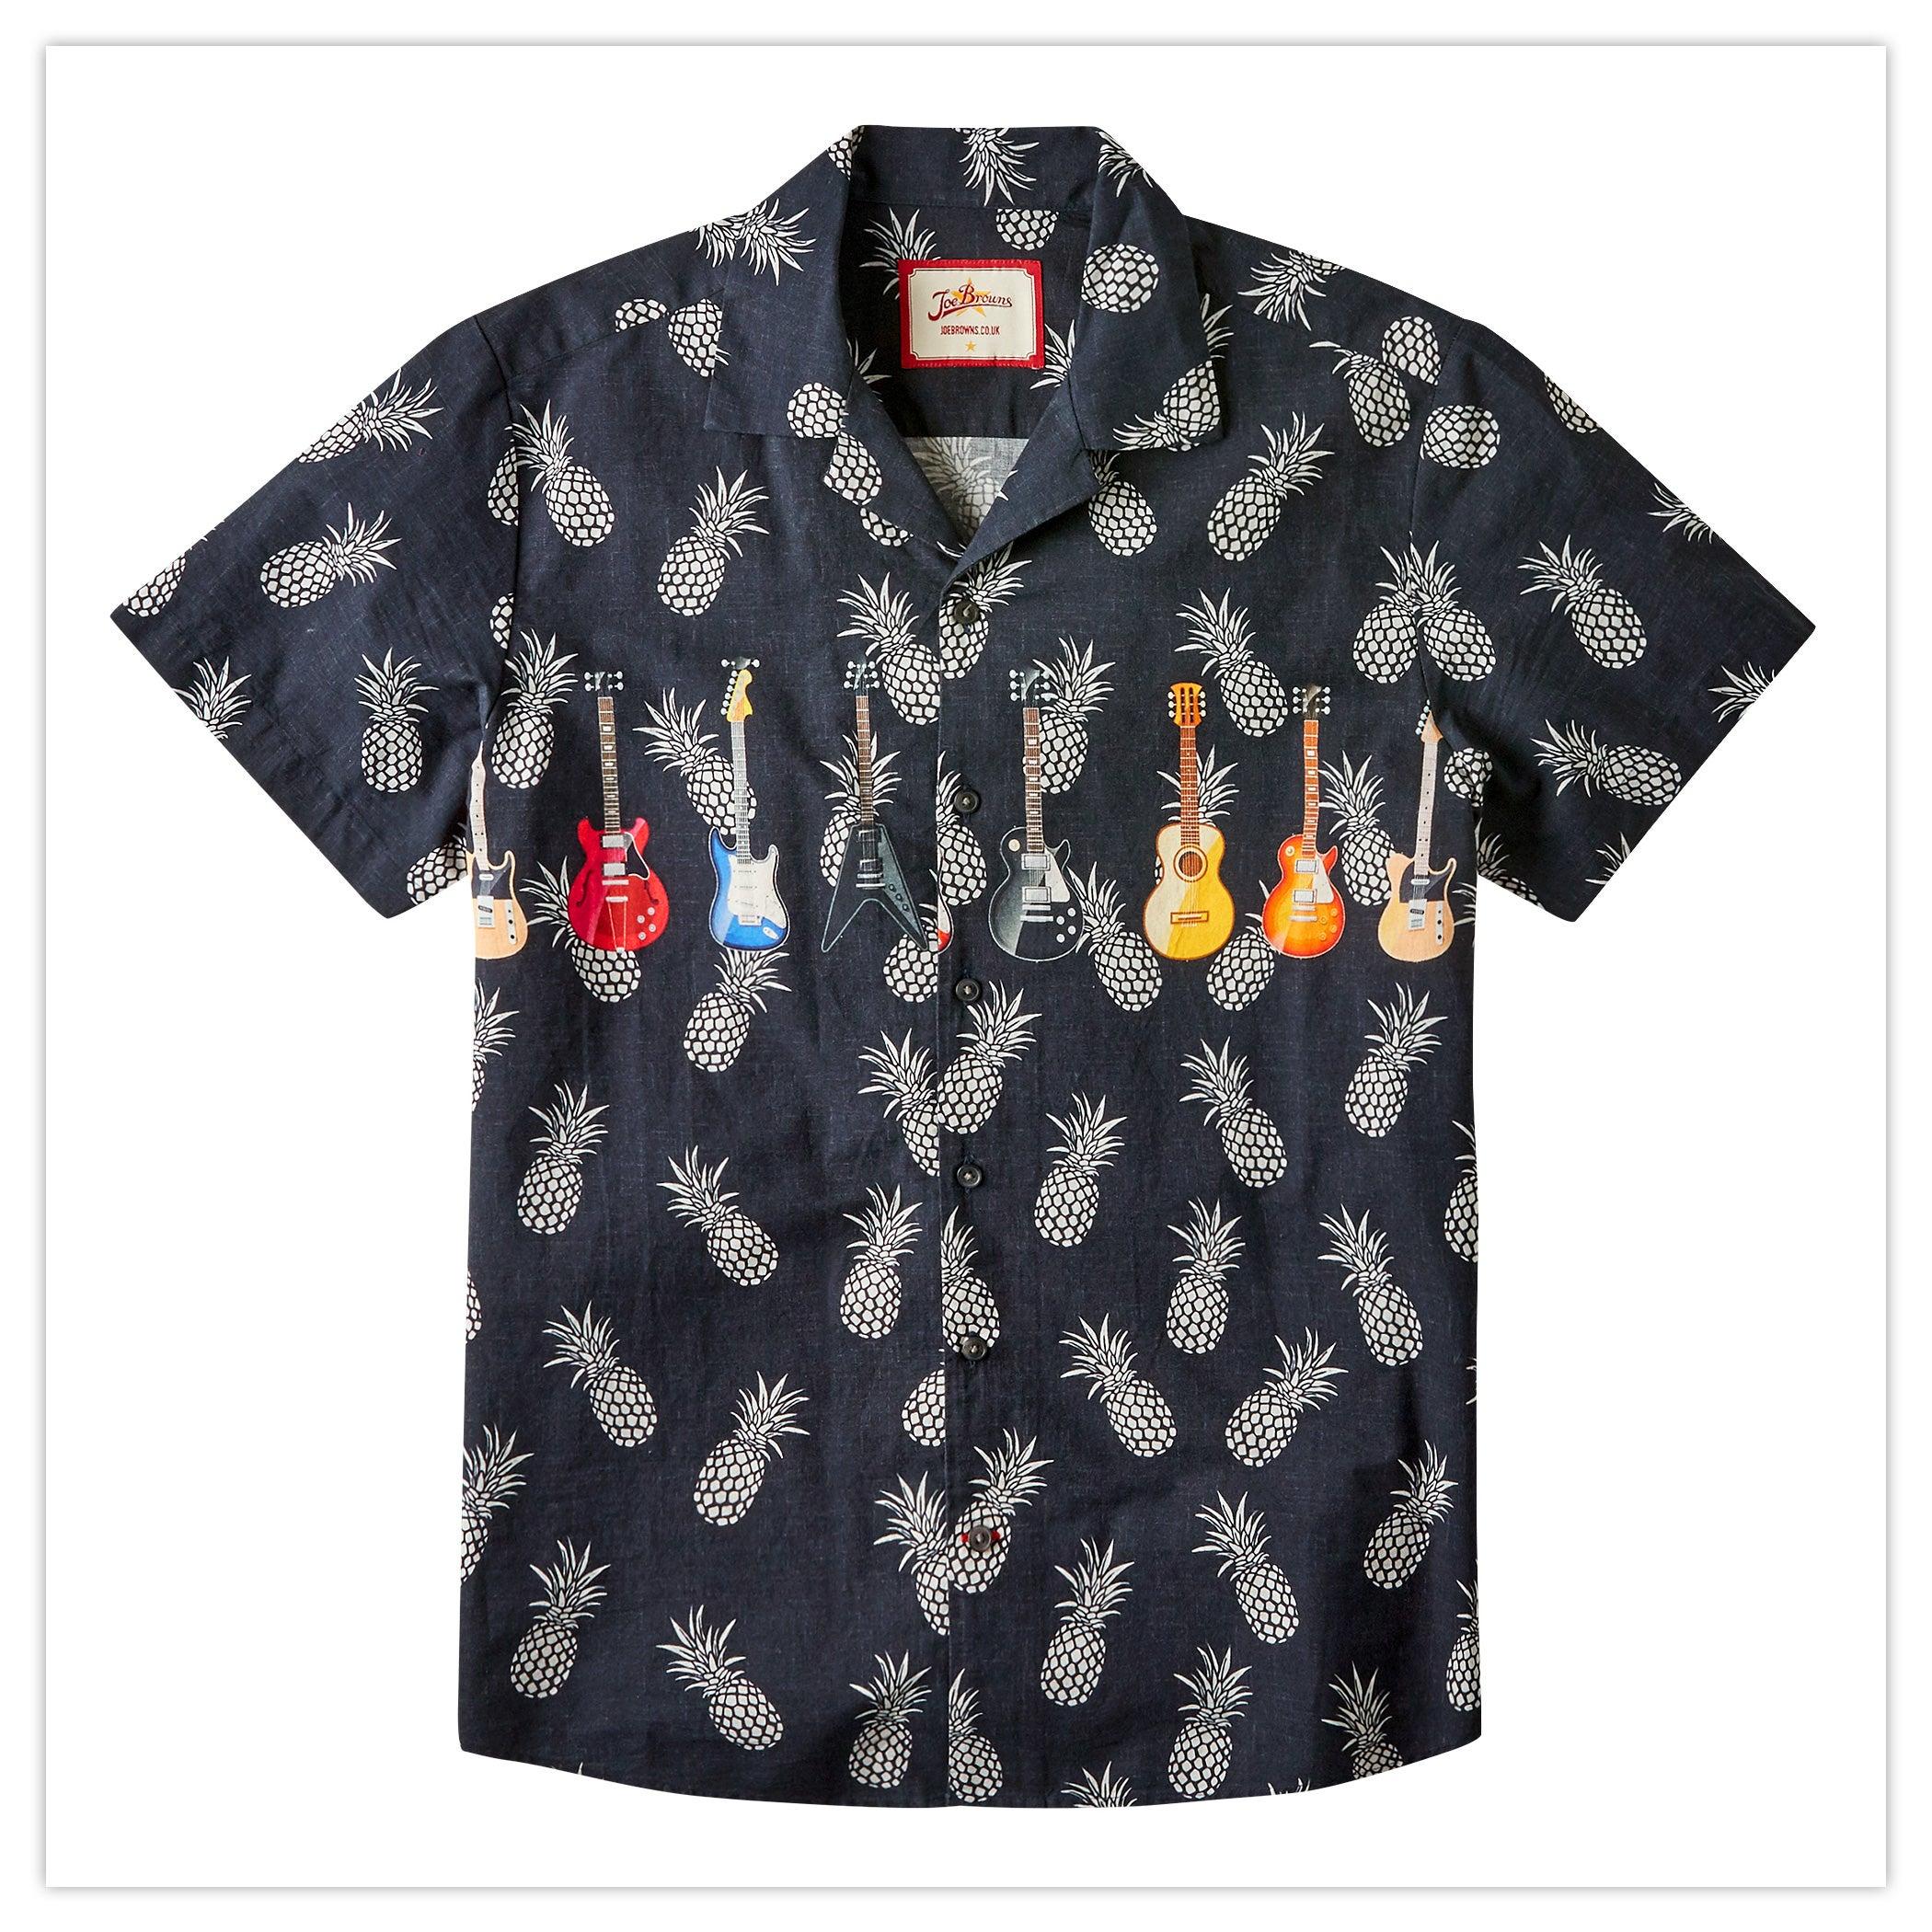 Music Mad Shirt